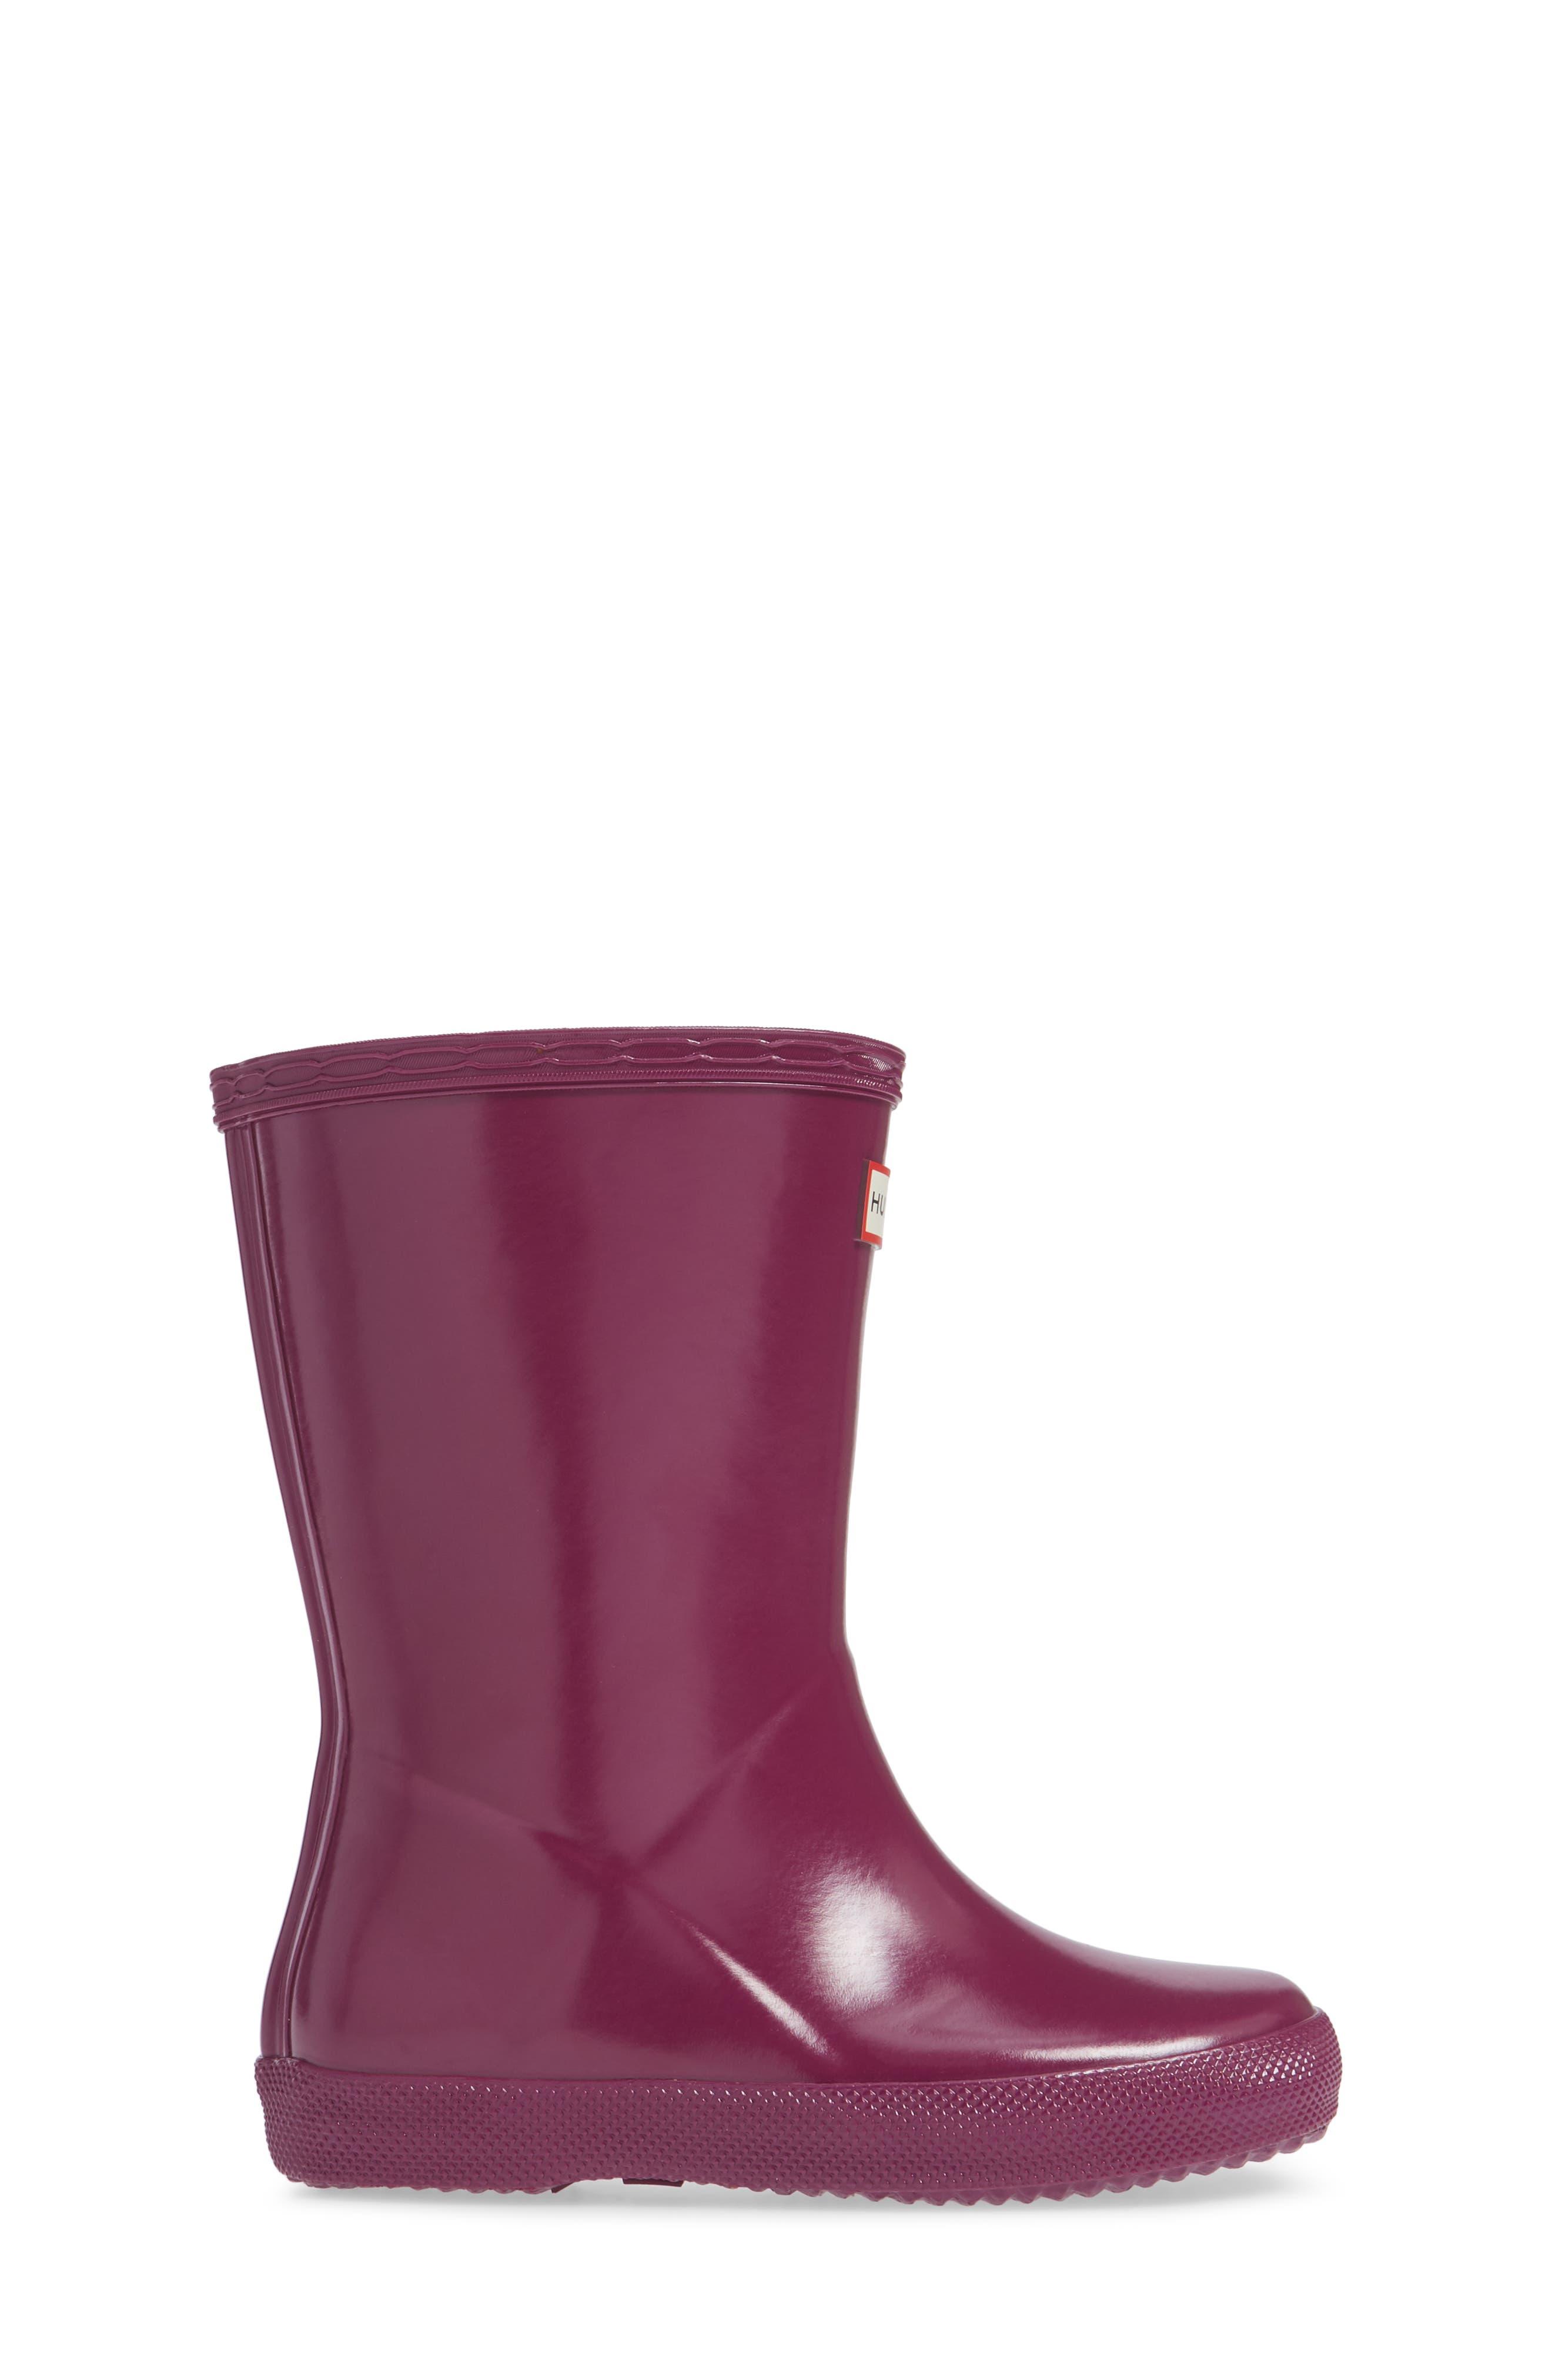 'First Gloss' Rain Boot,                             Alternate thumbnail 5, color,                             Violet